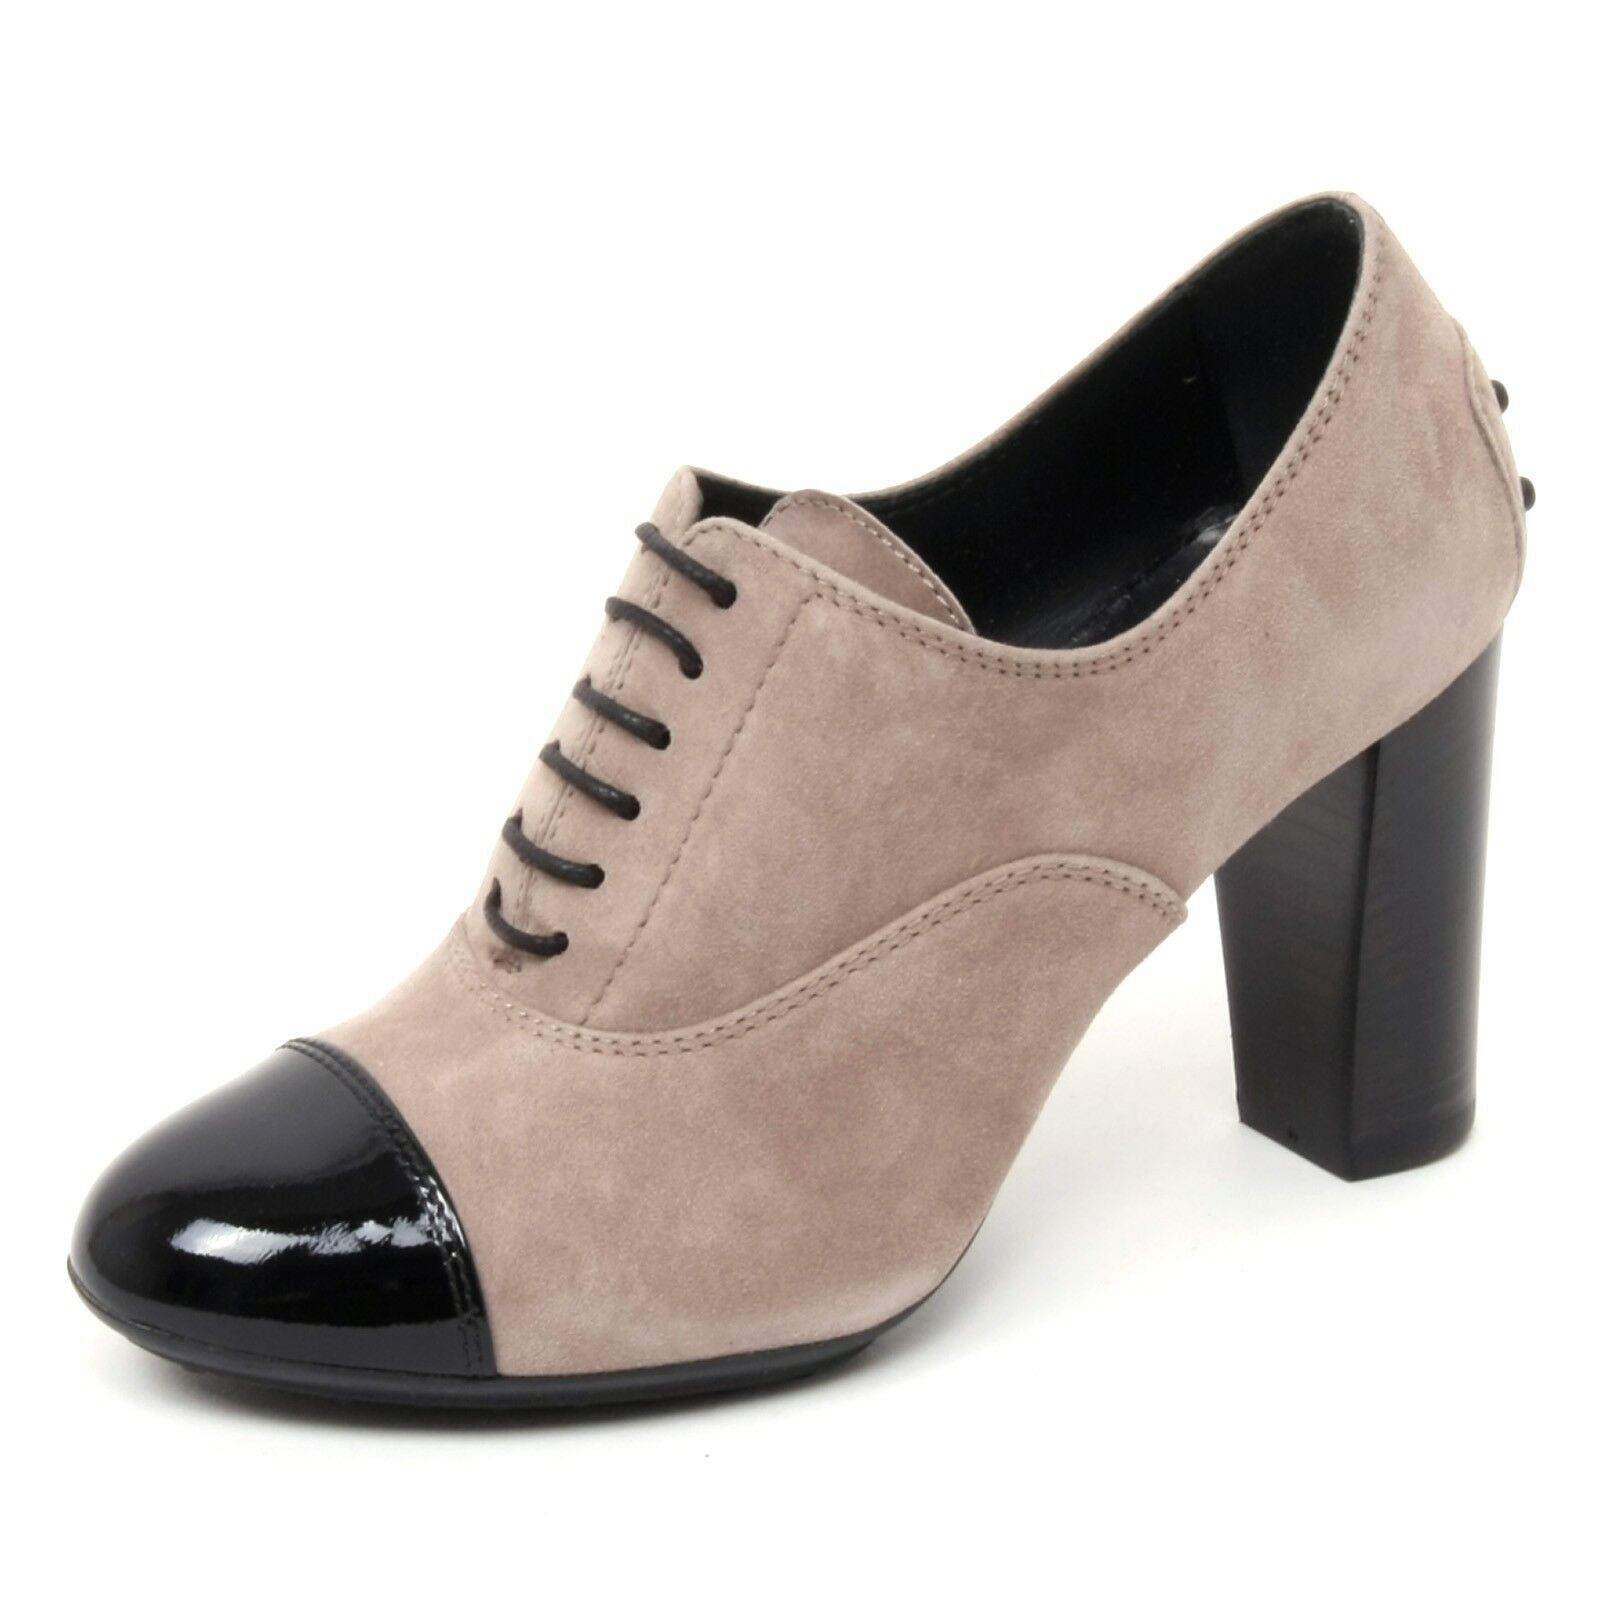 B4816 francesina donna 90 TOD'S scarpa n. tacco 90 donna tortora/nero shoe woman af2d2a